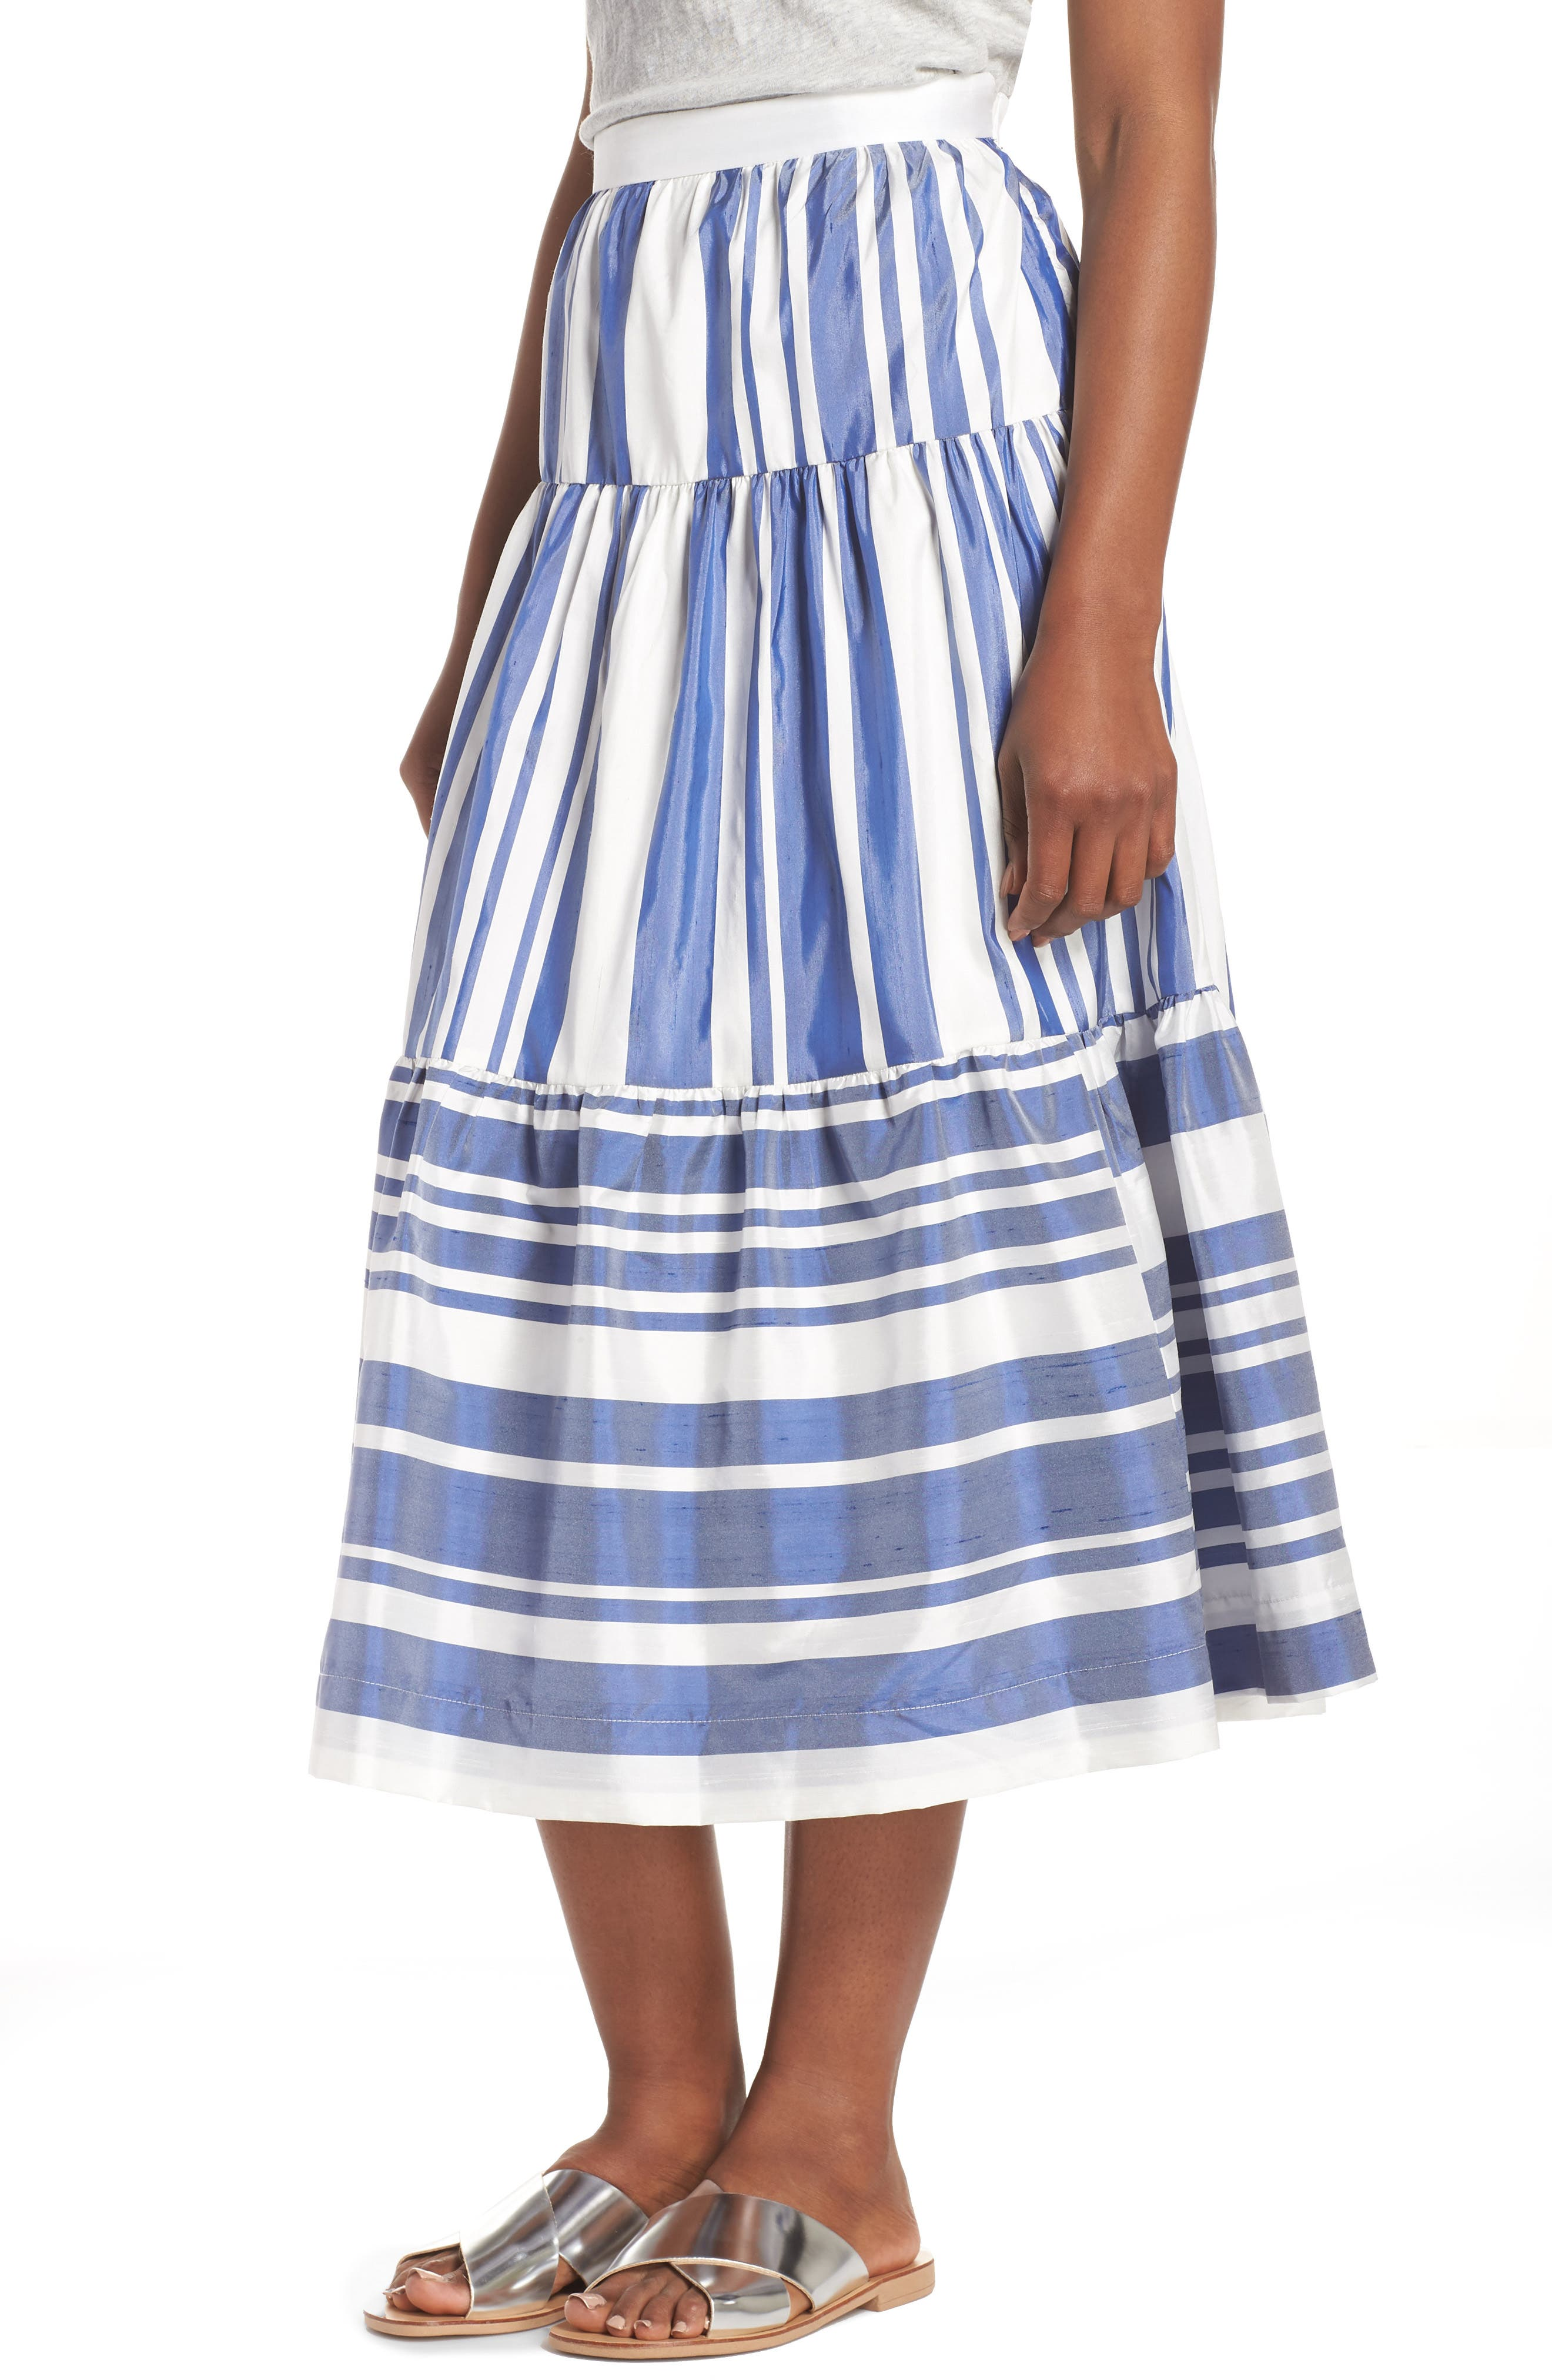 J.Crew Stripe Shantung Skirt